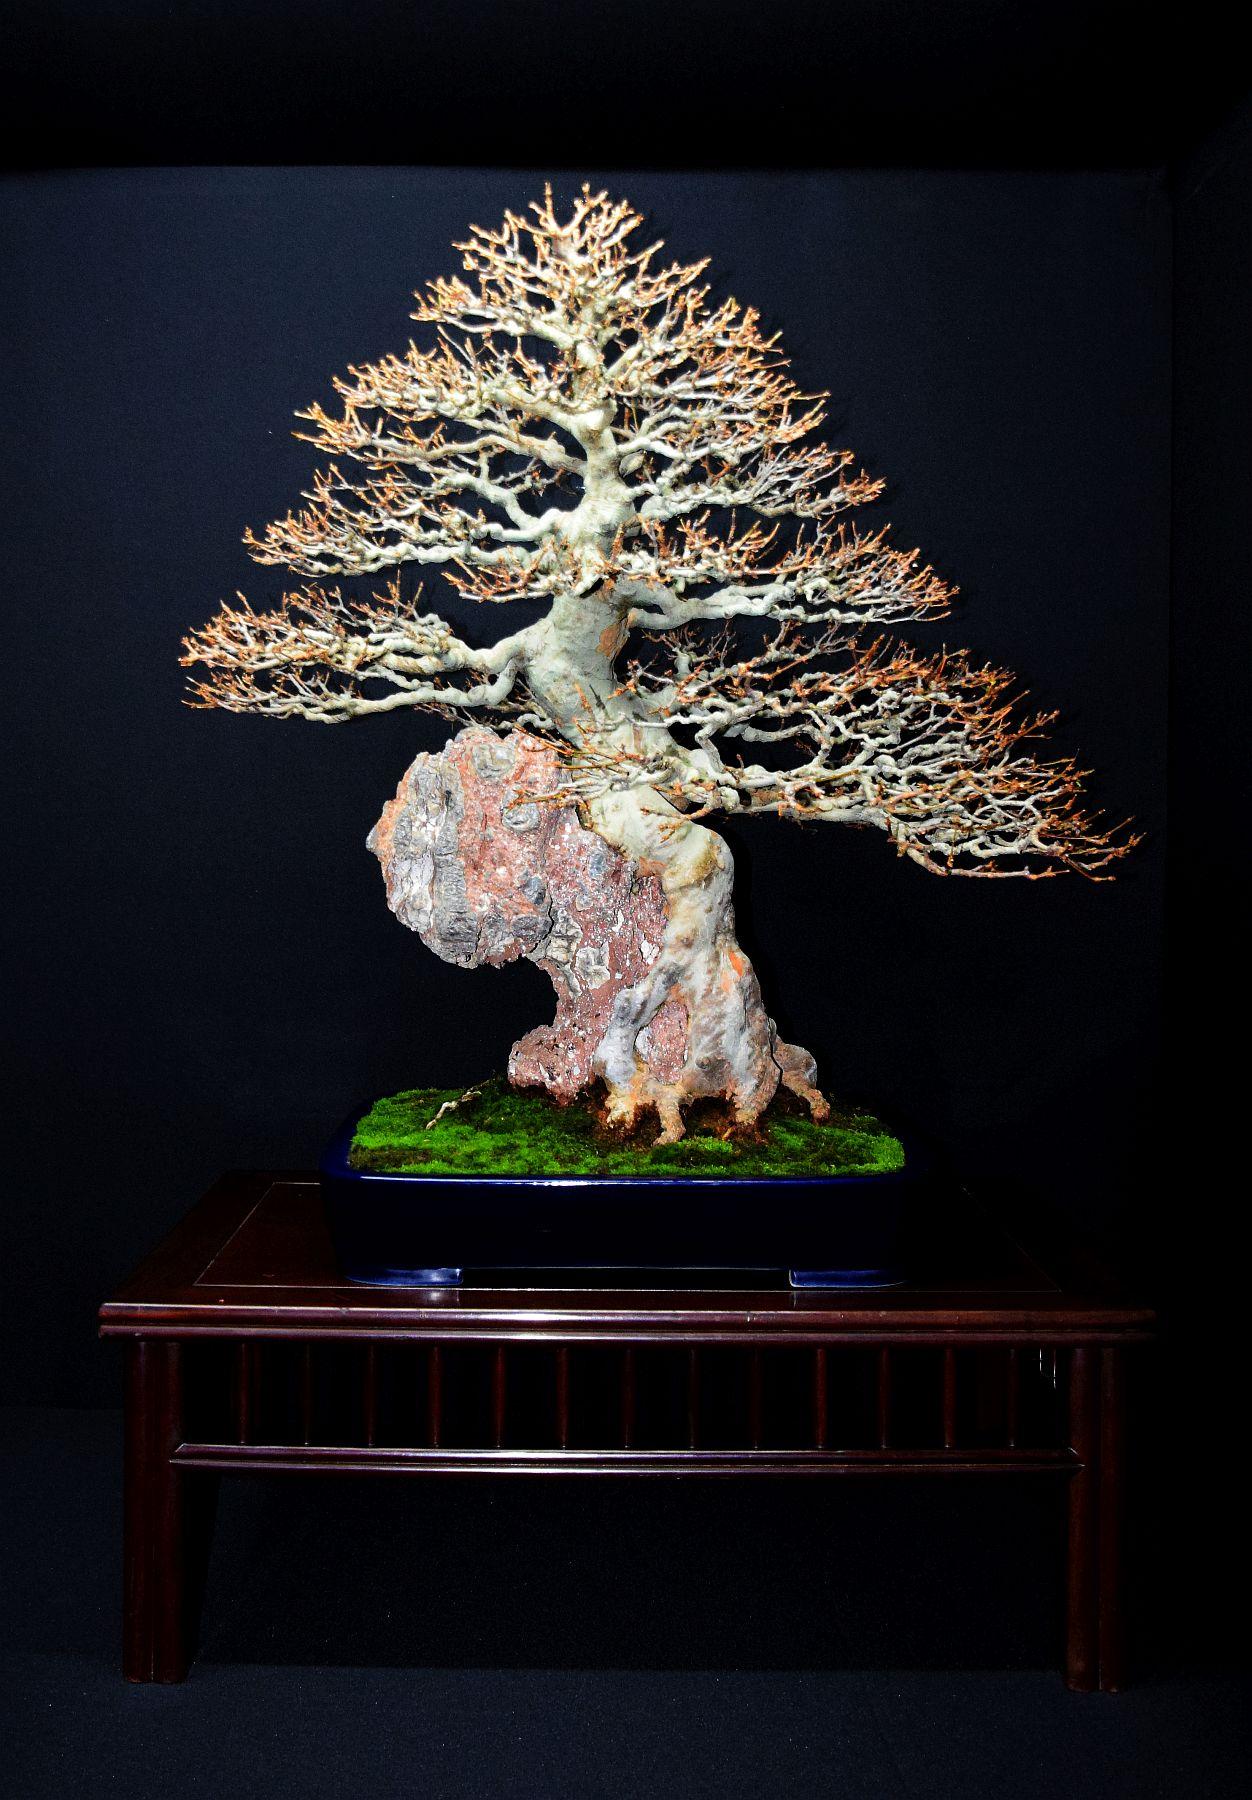 bonsai-museum-luis-vallejo-015